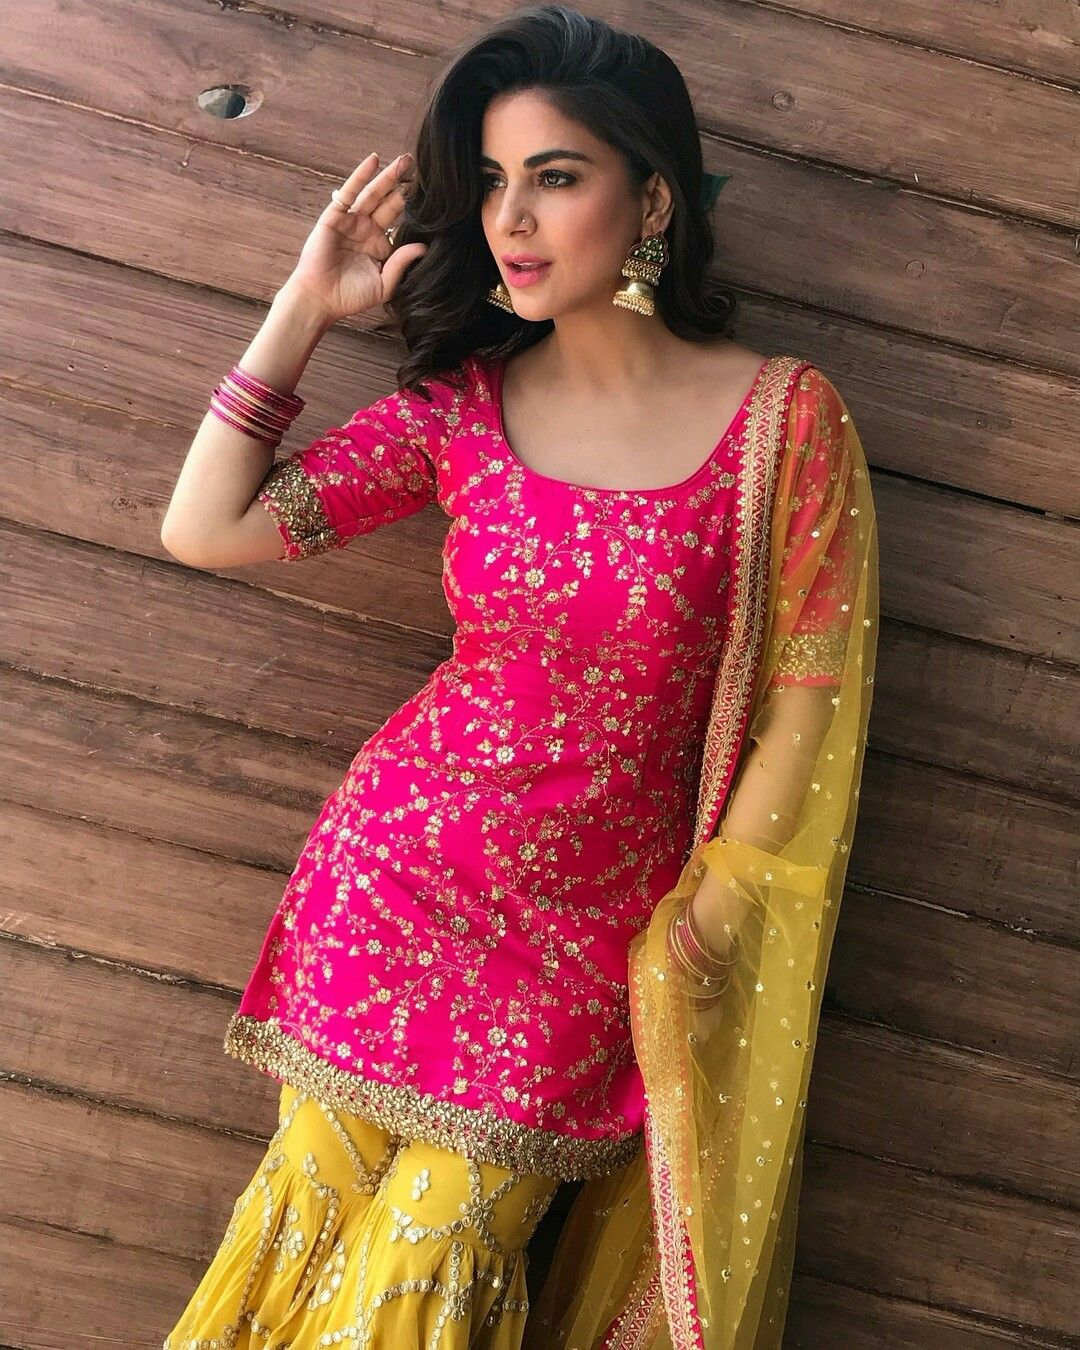 338b17cdf0 Beautiful Suit, Indian Tv Actress, Red Bikini, Fashion Design Sketches,  Punjabi Suits